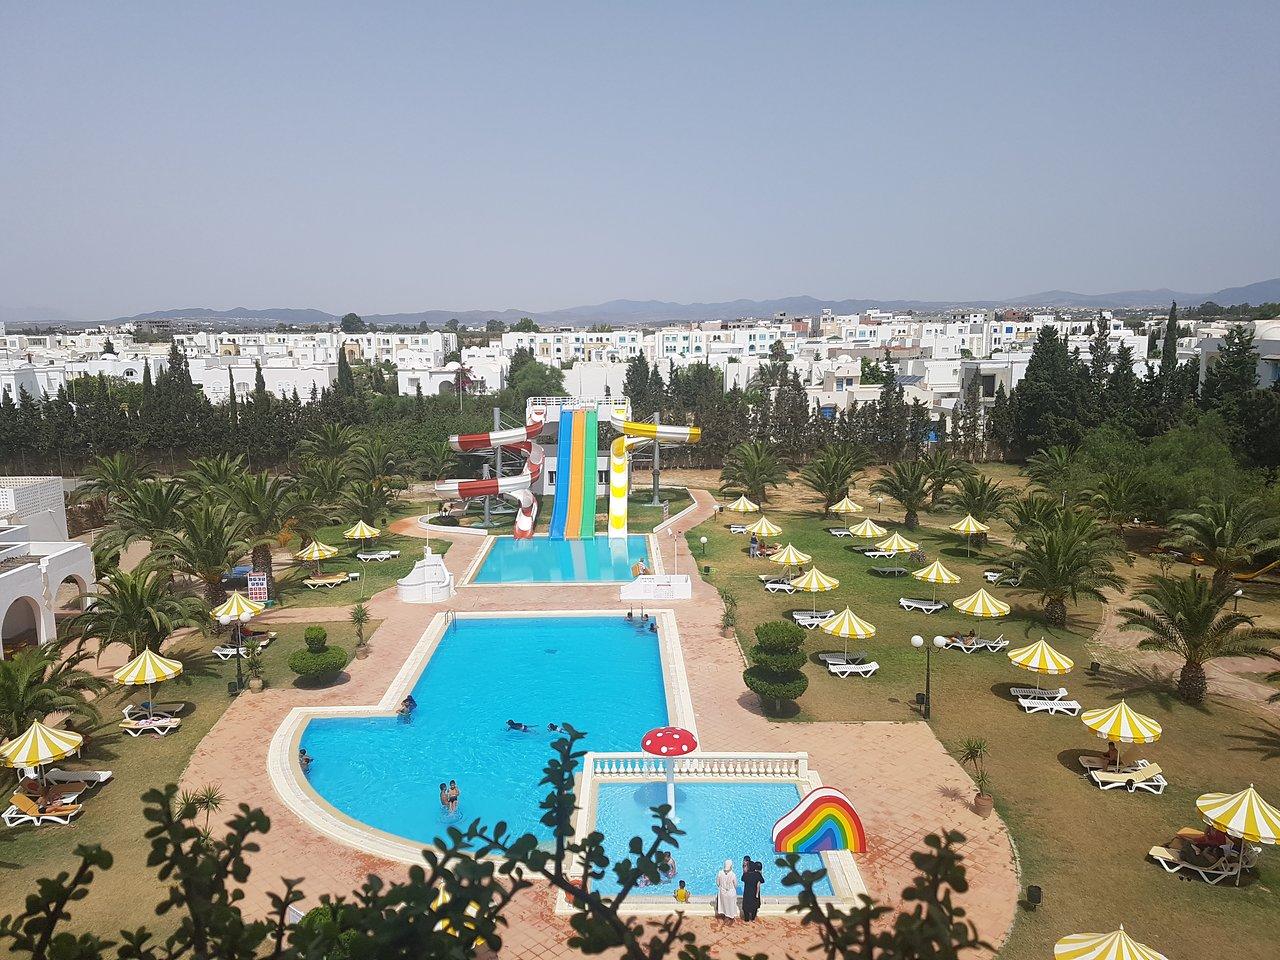 hotel green golf updated 2019 prices reviews hammamet tunisia rh tripadvisor com